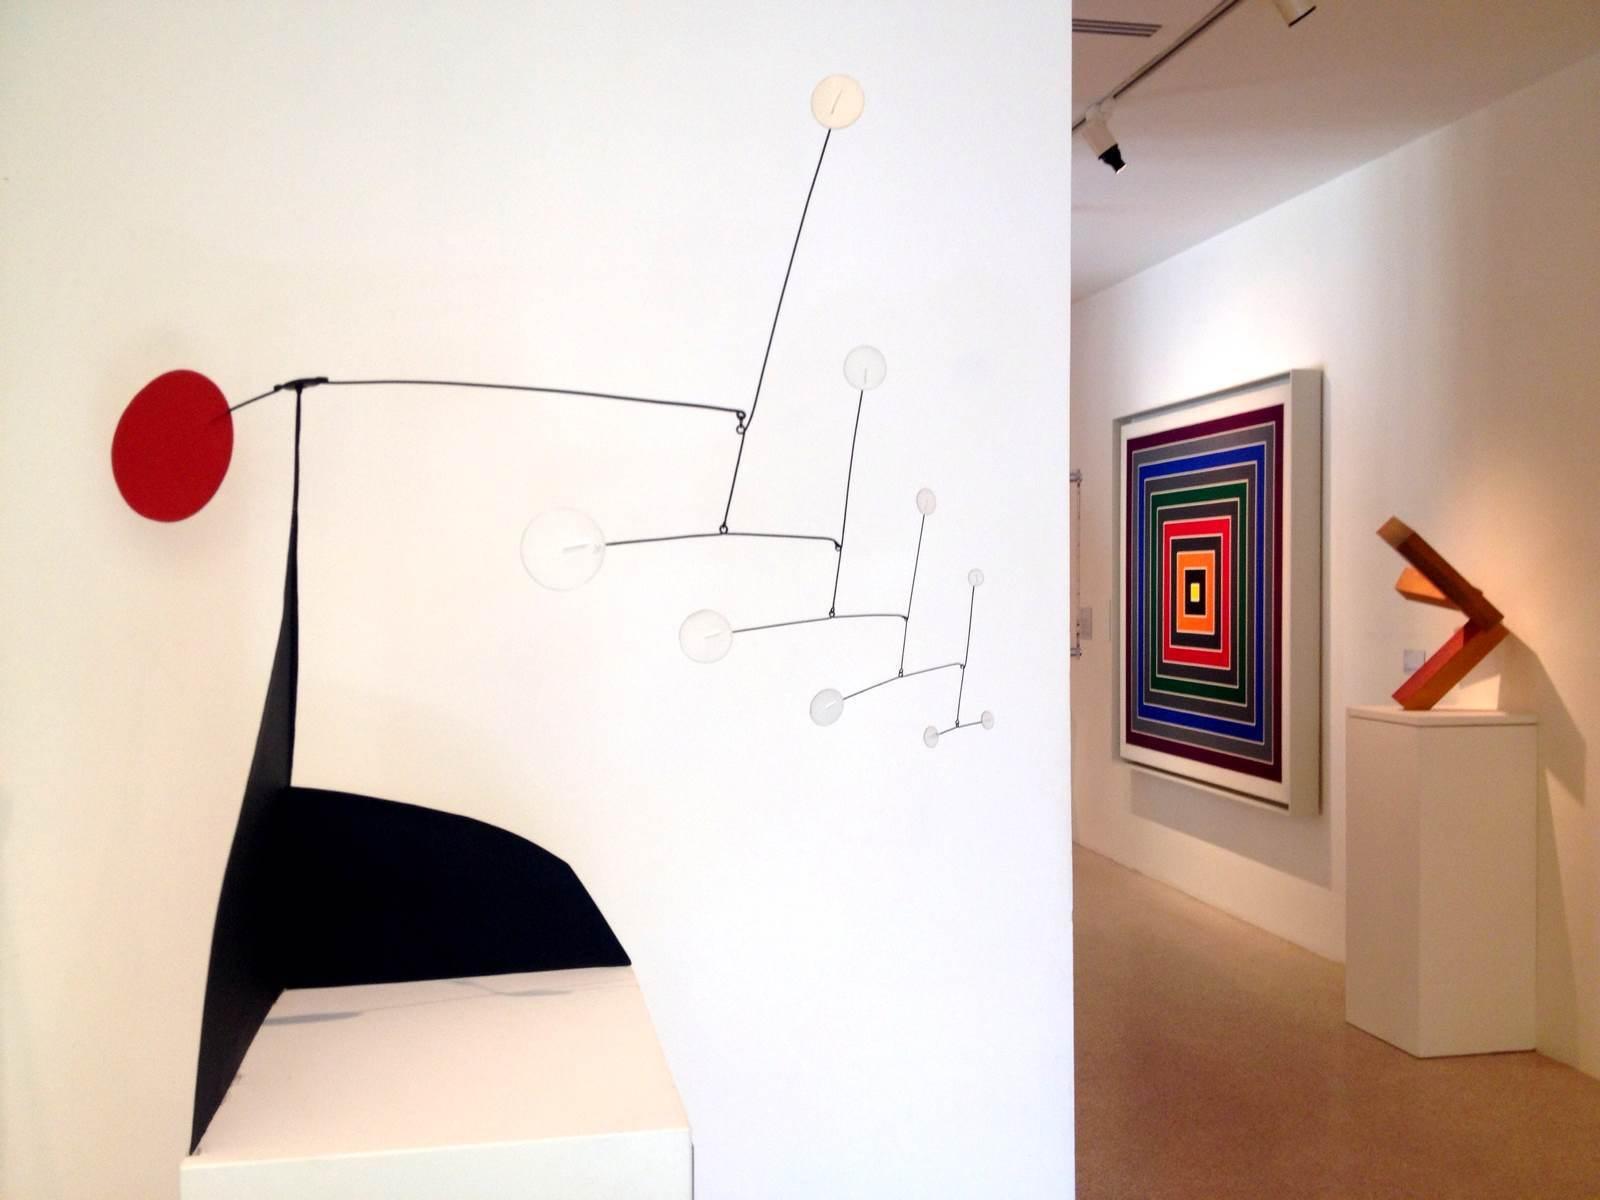 佩姬·古根汉美术馆  Peggy Guggenheim Collection   -4